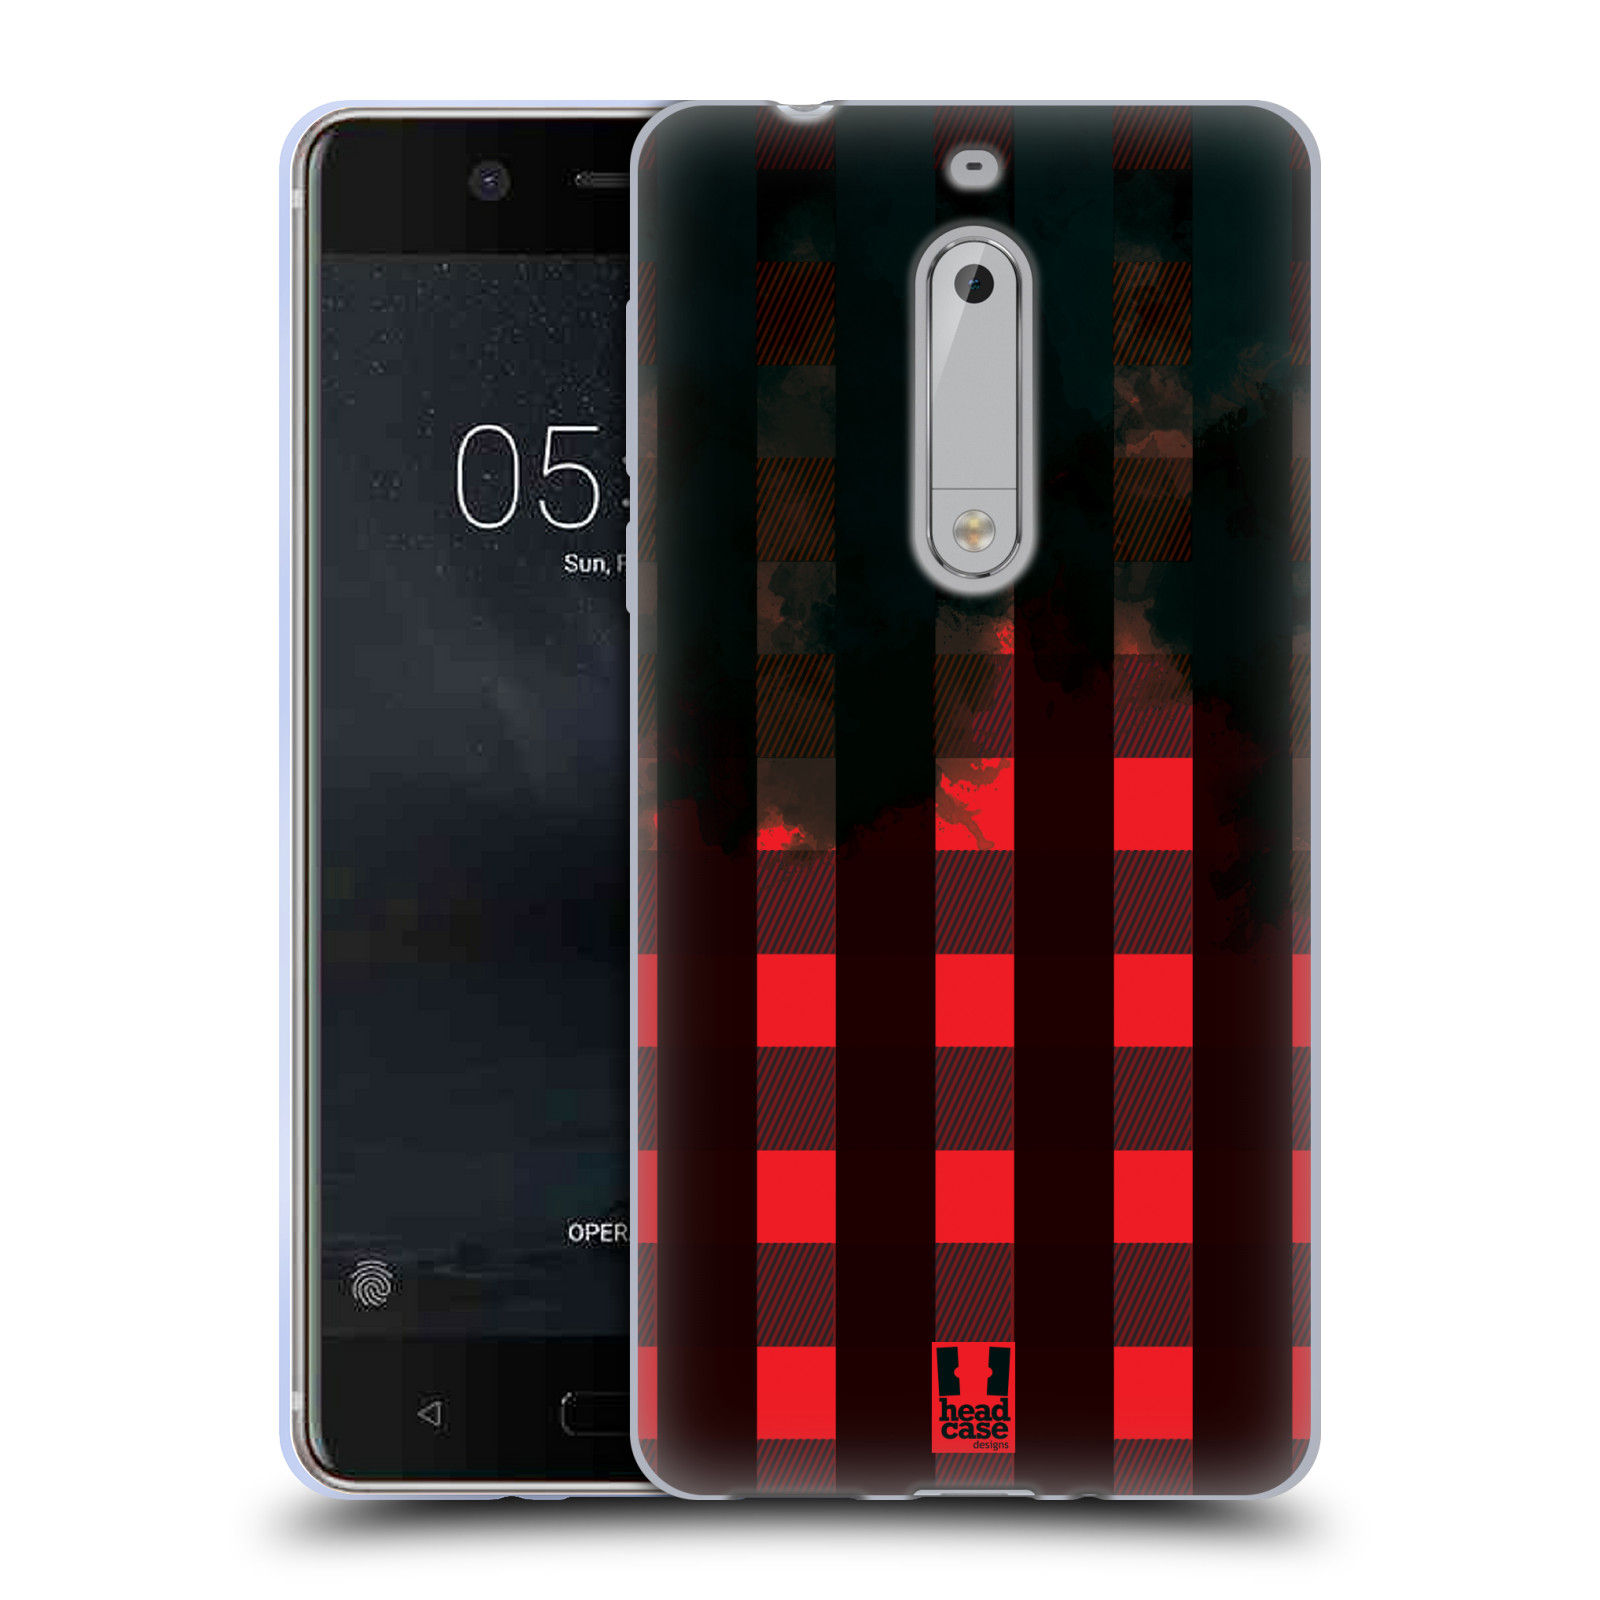 Silikonové pouzdro na mobil Nokia 5 Head Case - FLANEL RED BLACK